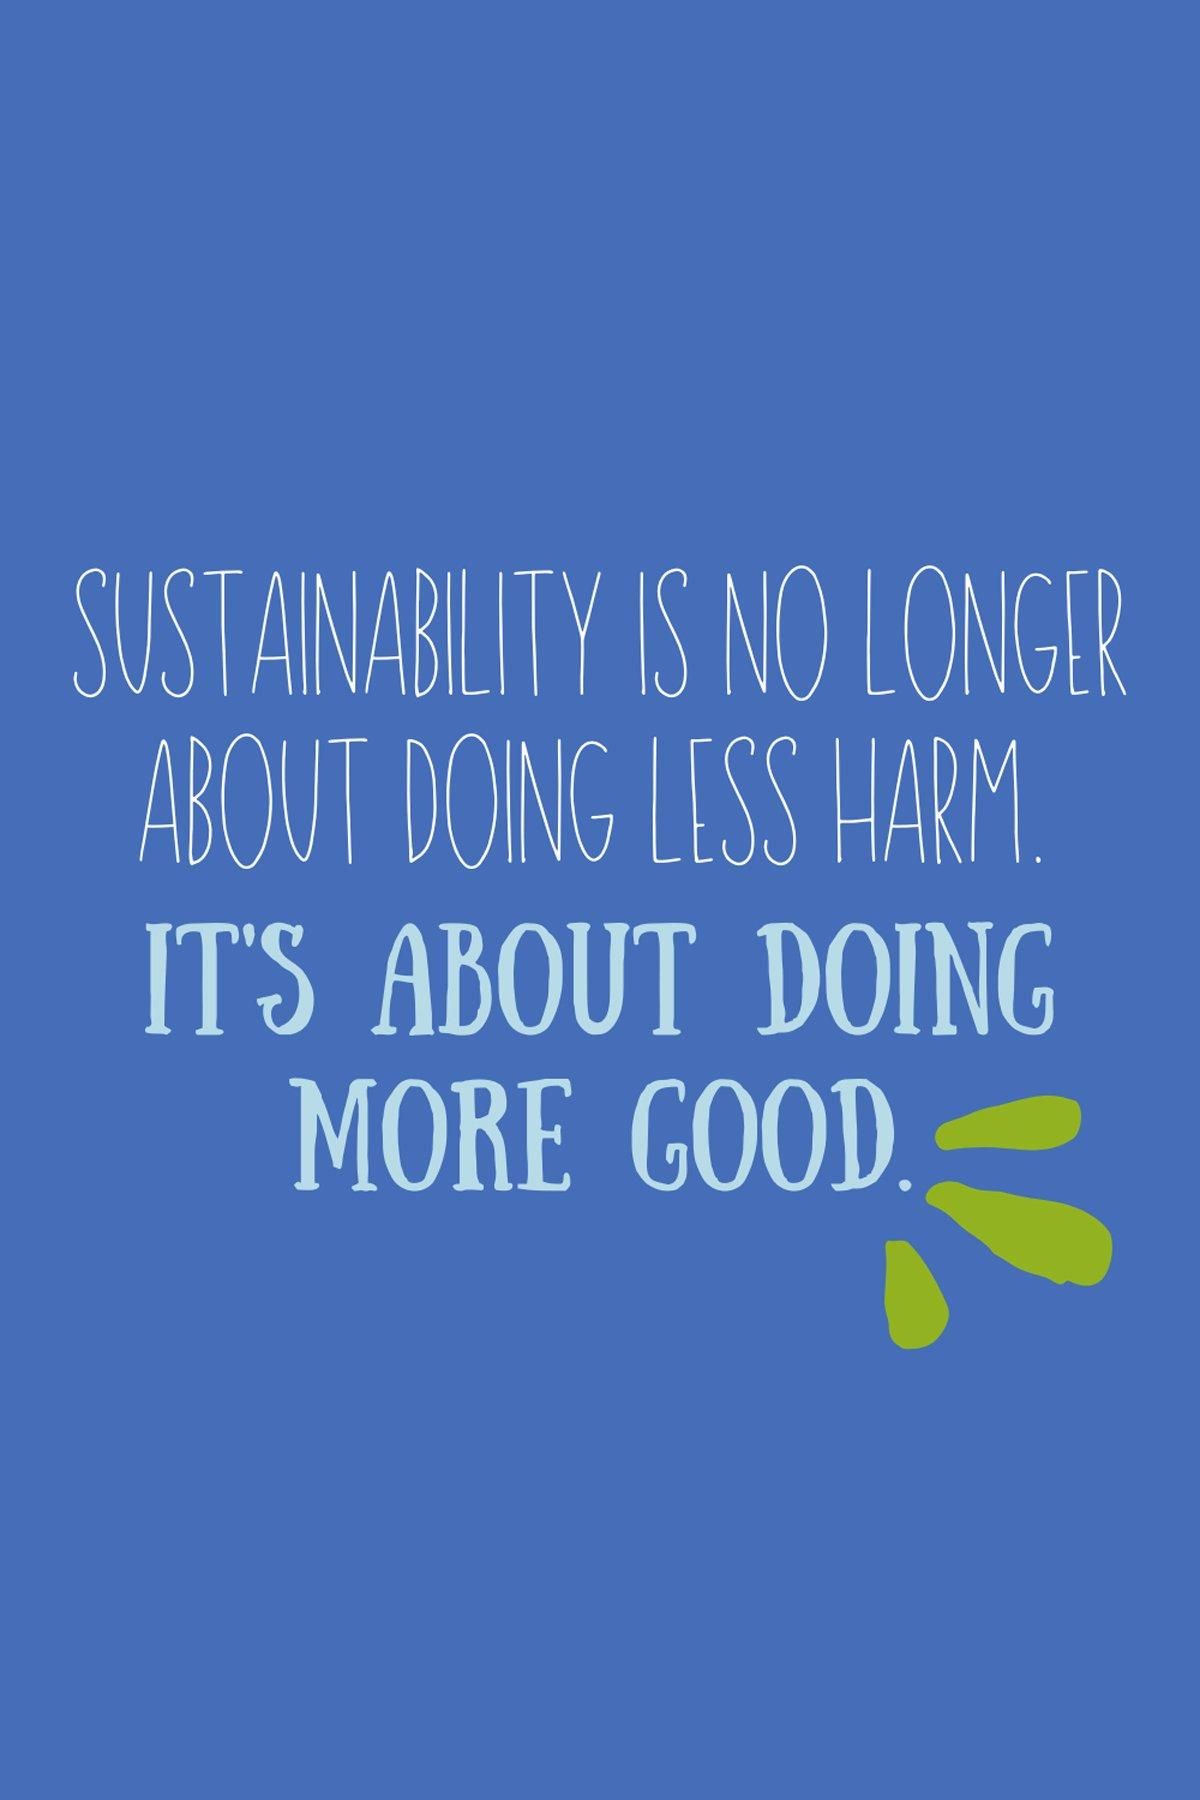 True Sustainability Sayings